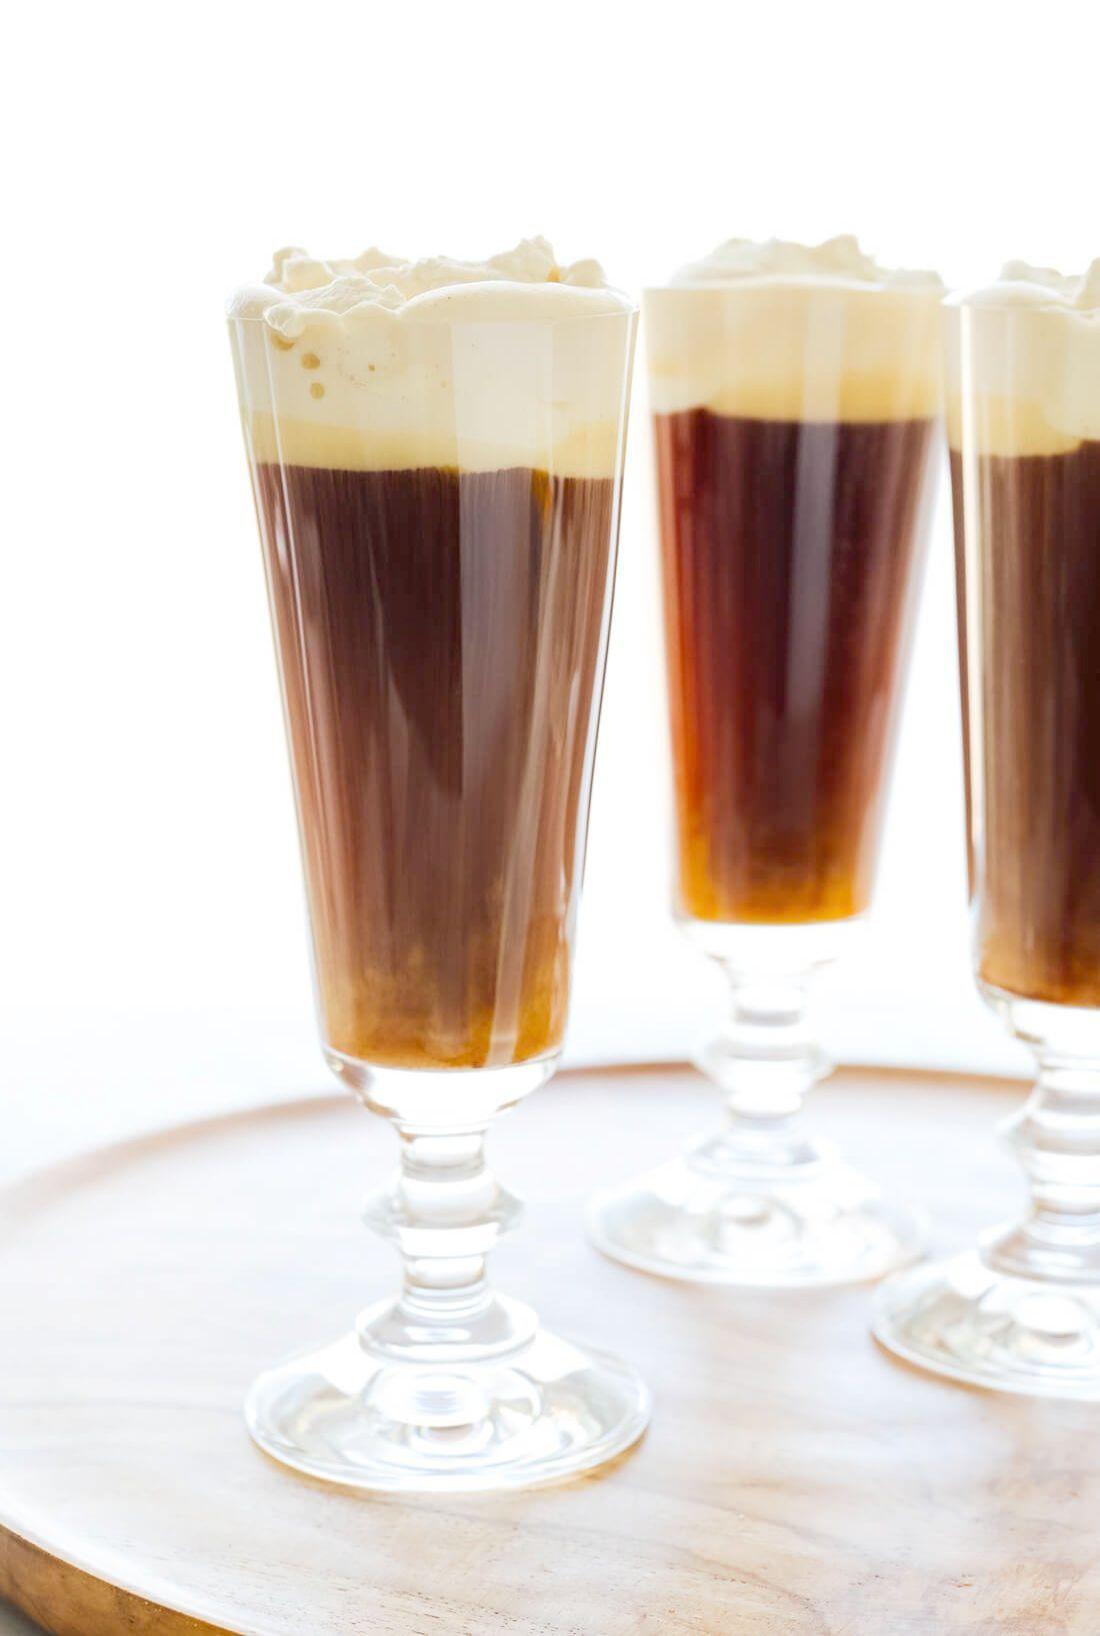 Coffee Shop Au Like Coffee Shops Near Me Open 24 Hours As Coffee Near Me Kauai Every Best Coffee Drinks In Star Irish Coffee Recipe Irish Coffee Coffee Recipes